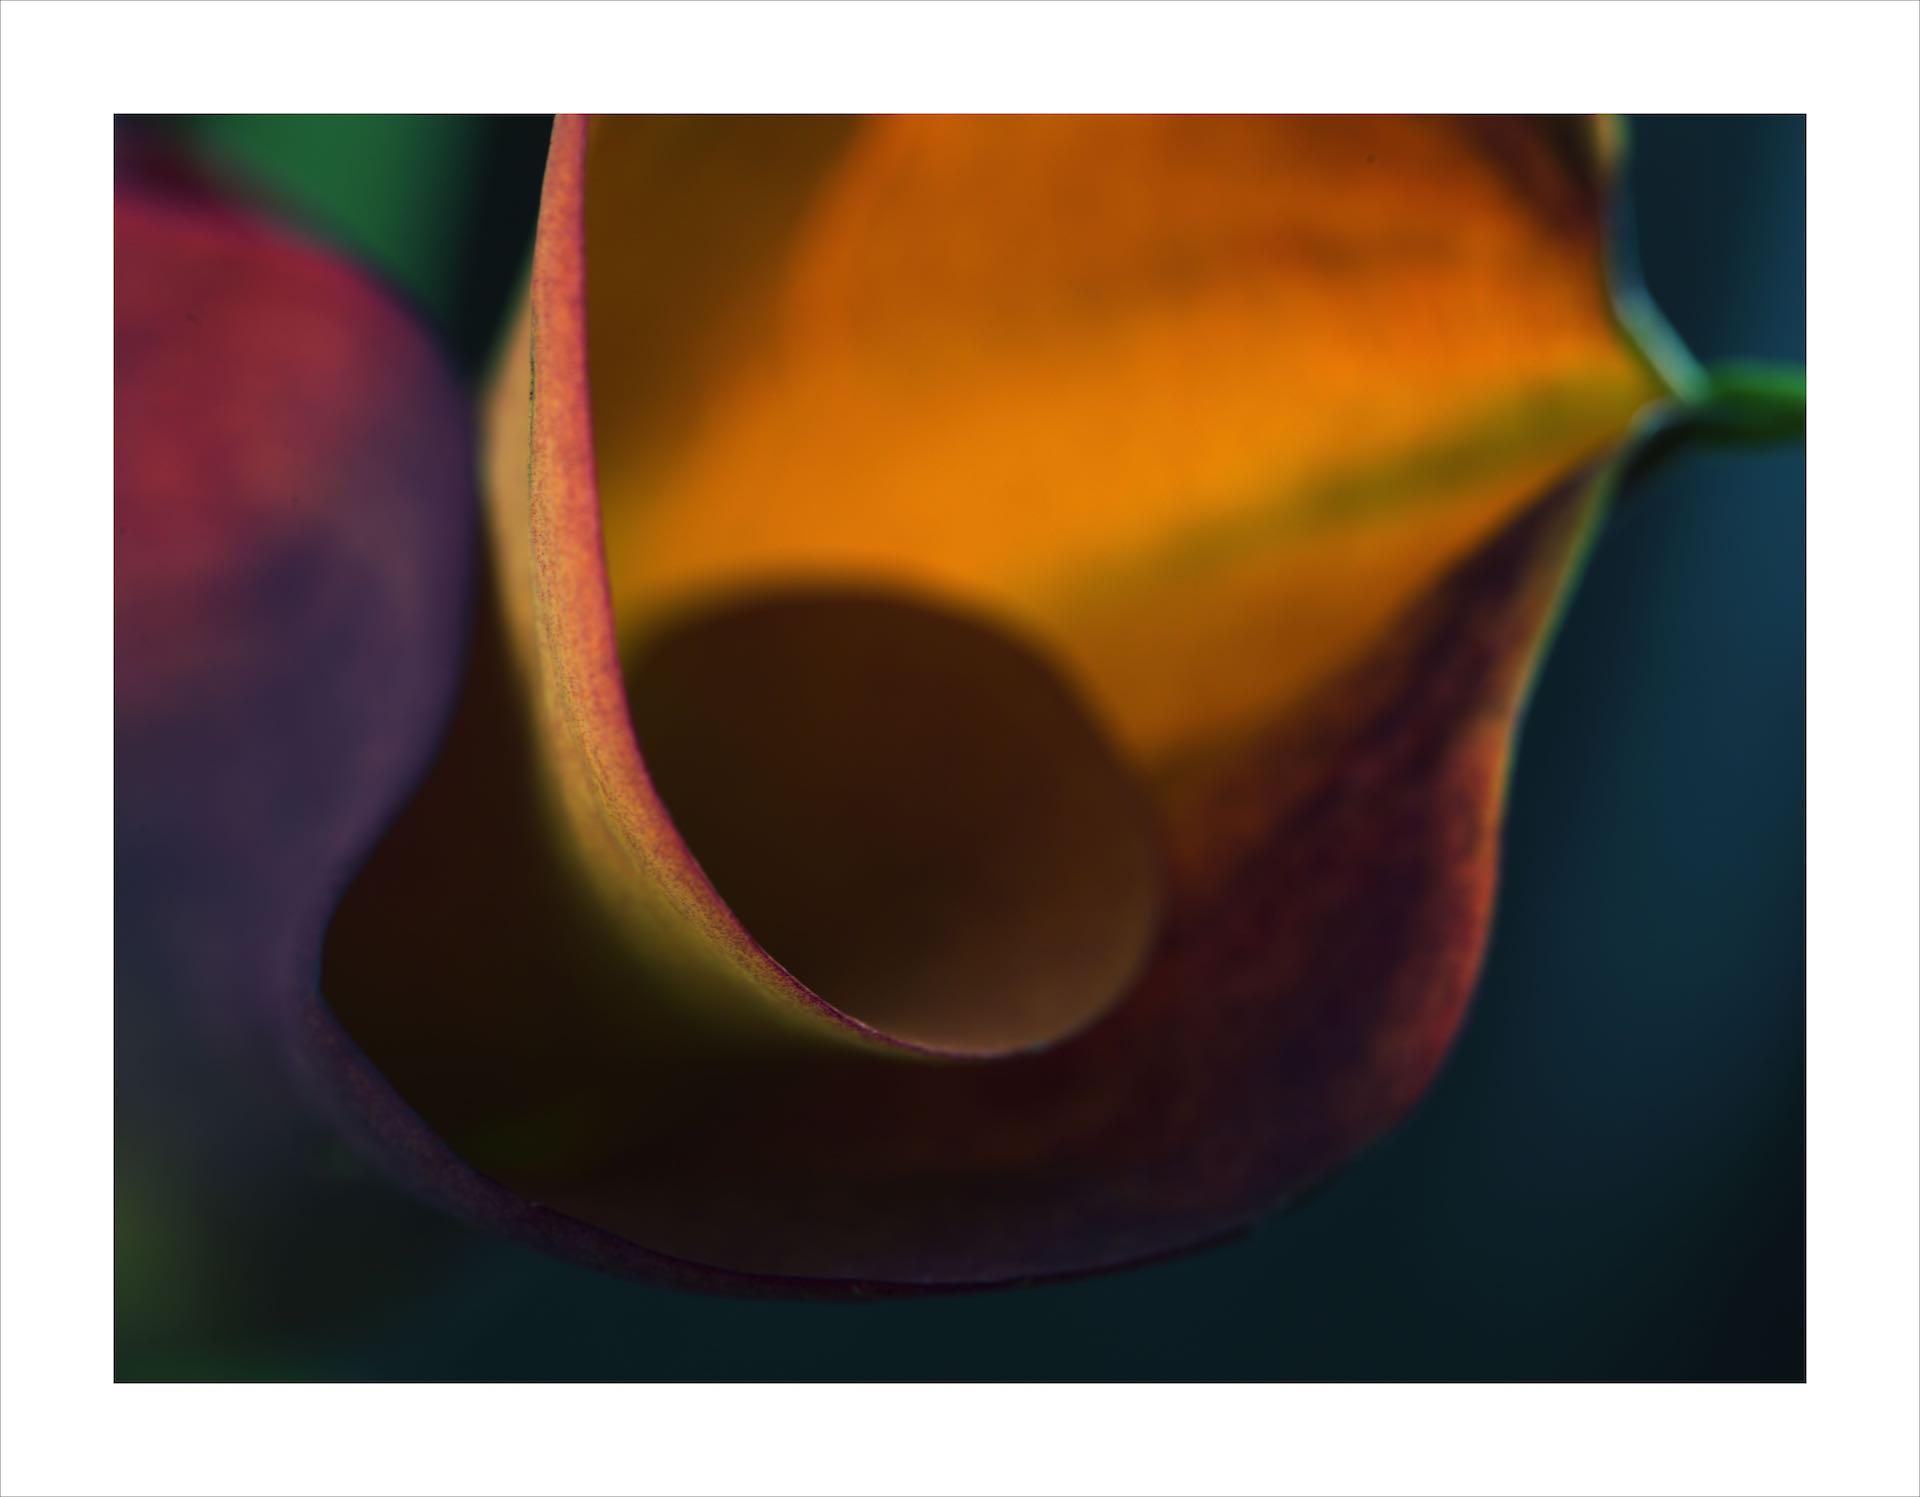 Untitled (Orange) by JESSICA TAMPAS